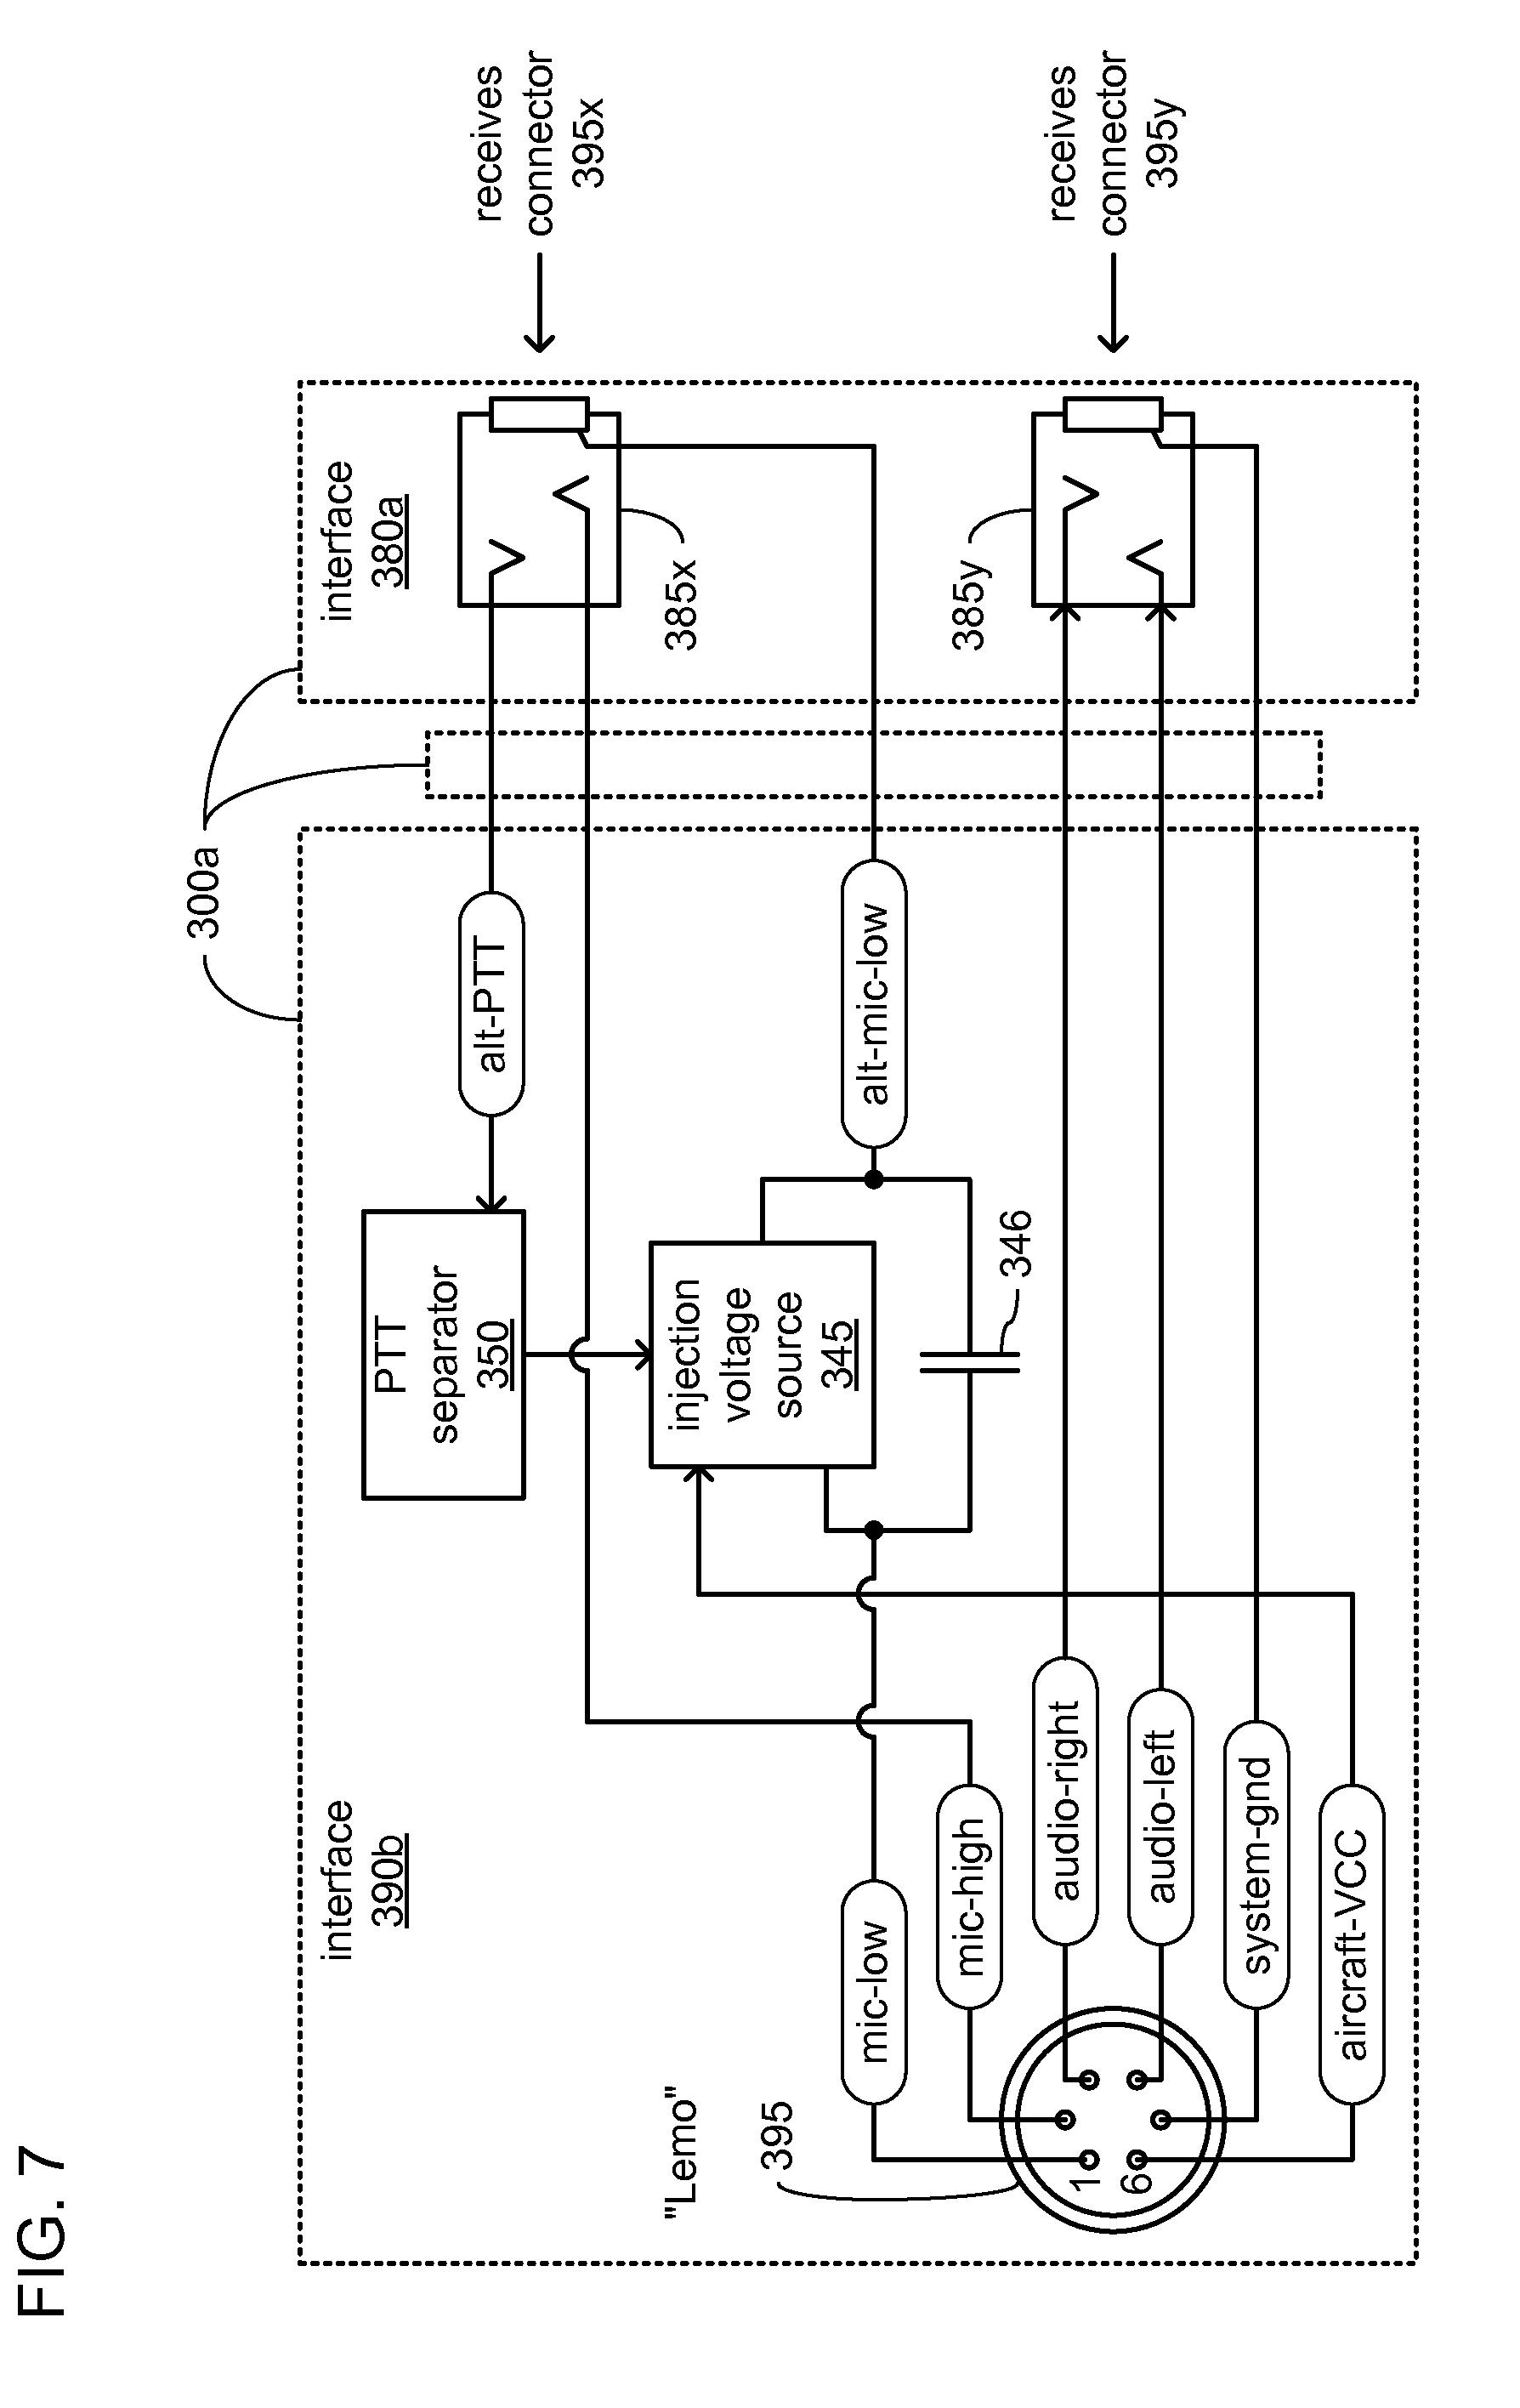 3 wire microphone wiring diagram mitsubishi lancer alternator headset jack 07 chrysler sebring fuse